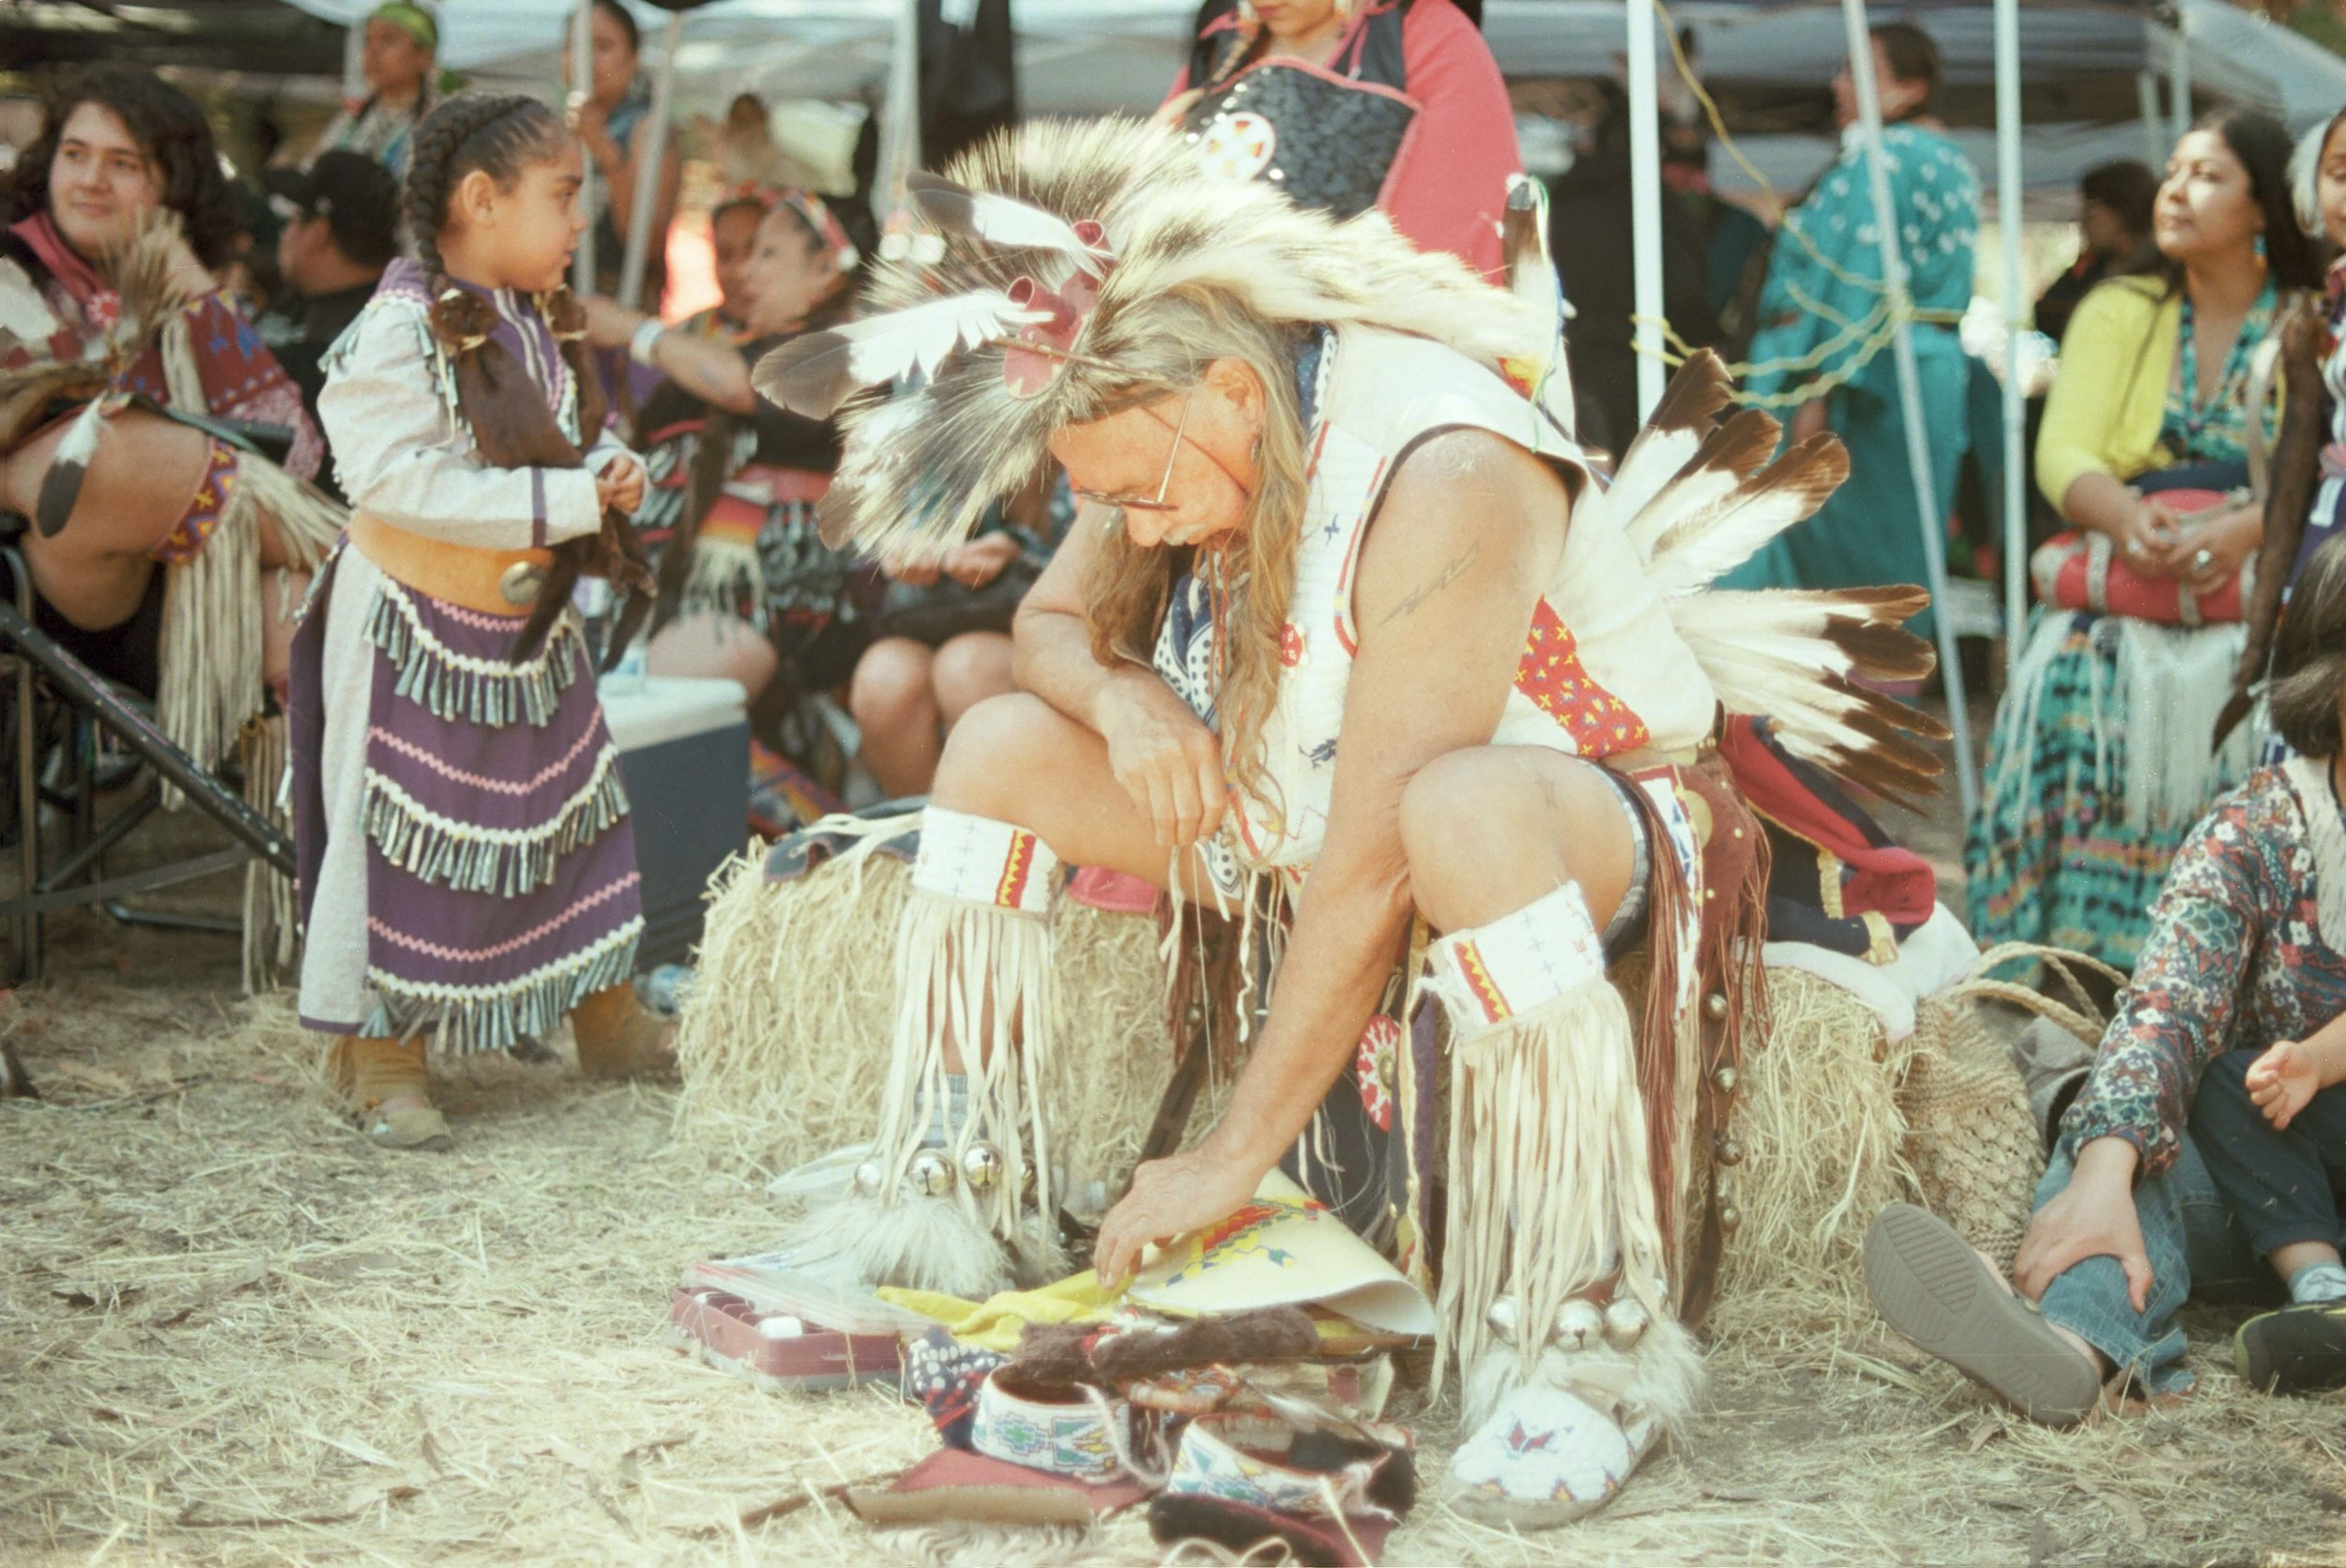 The California indians | California 2015